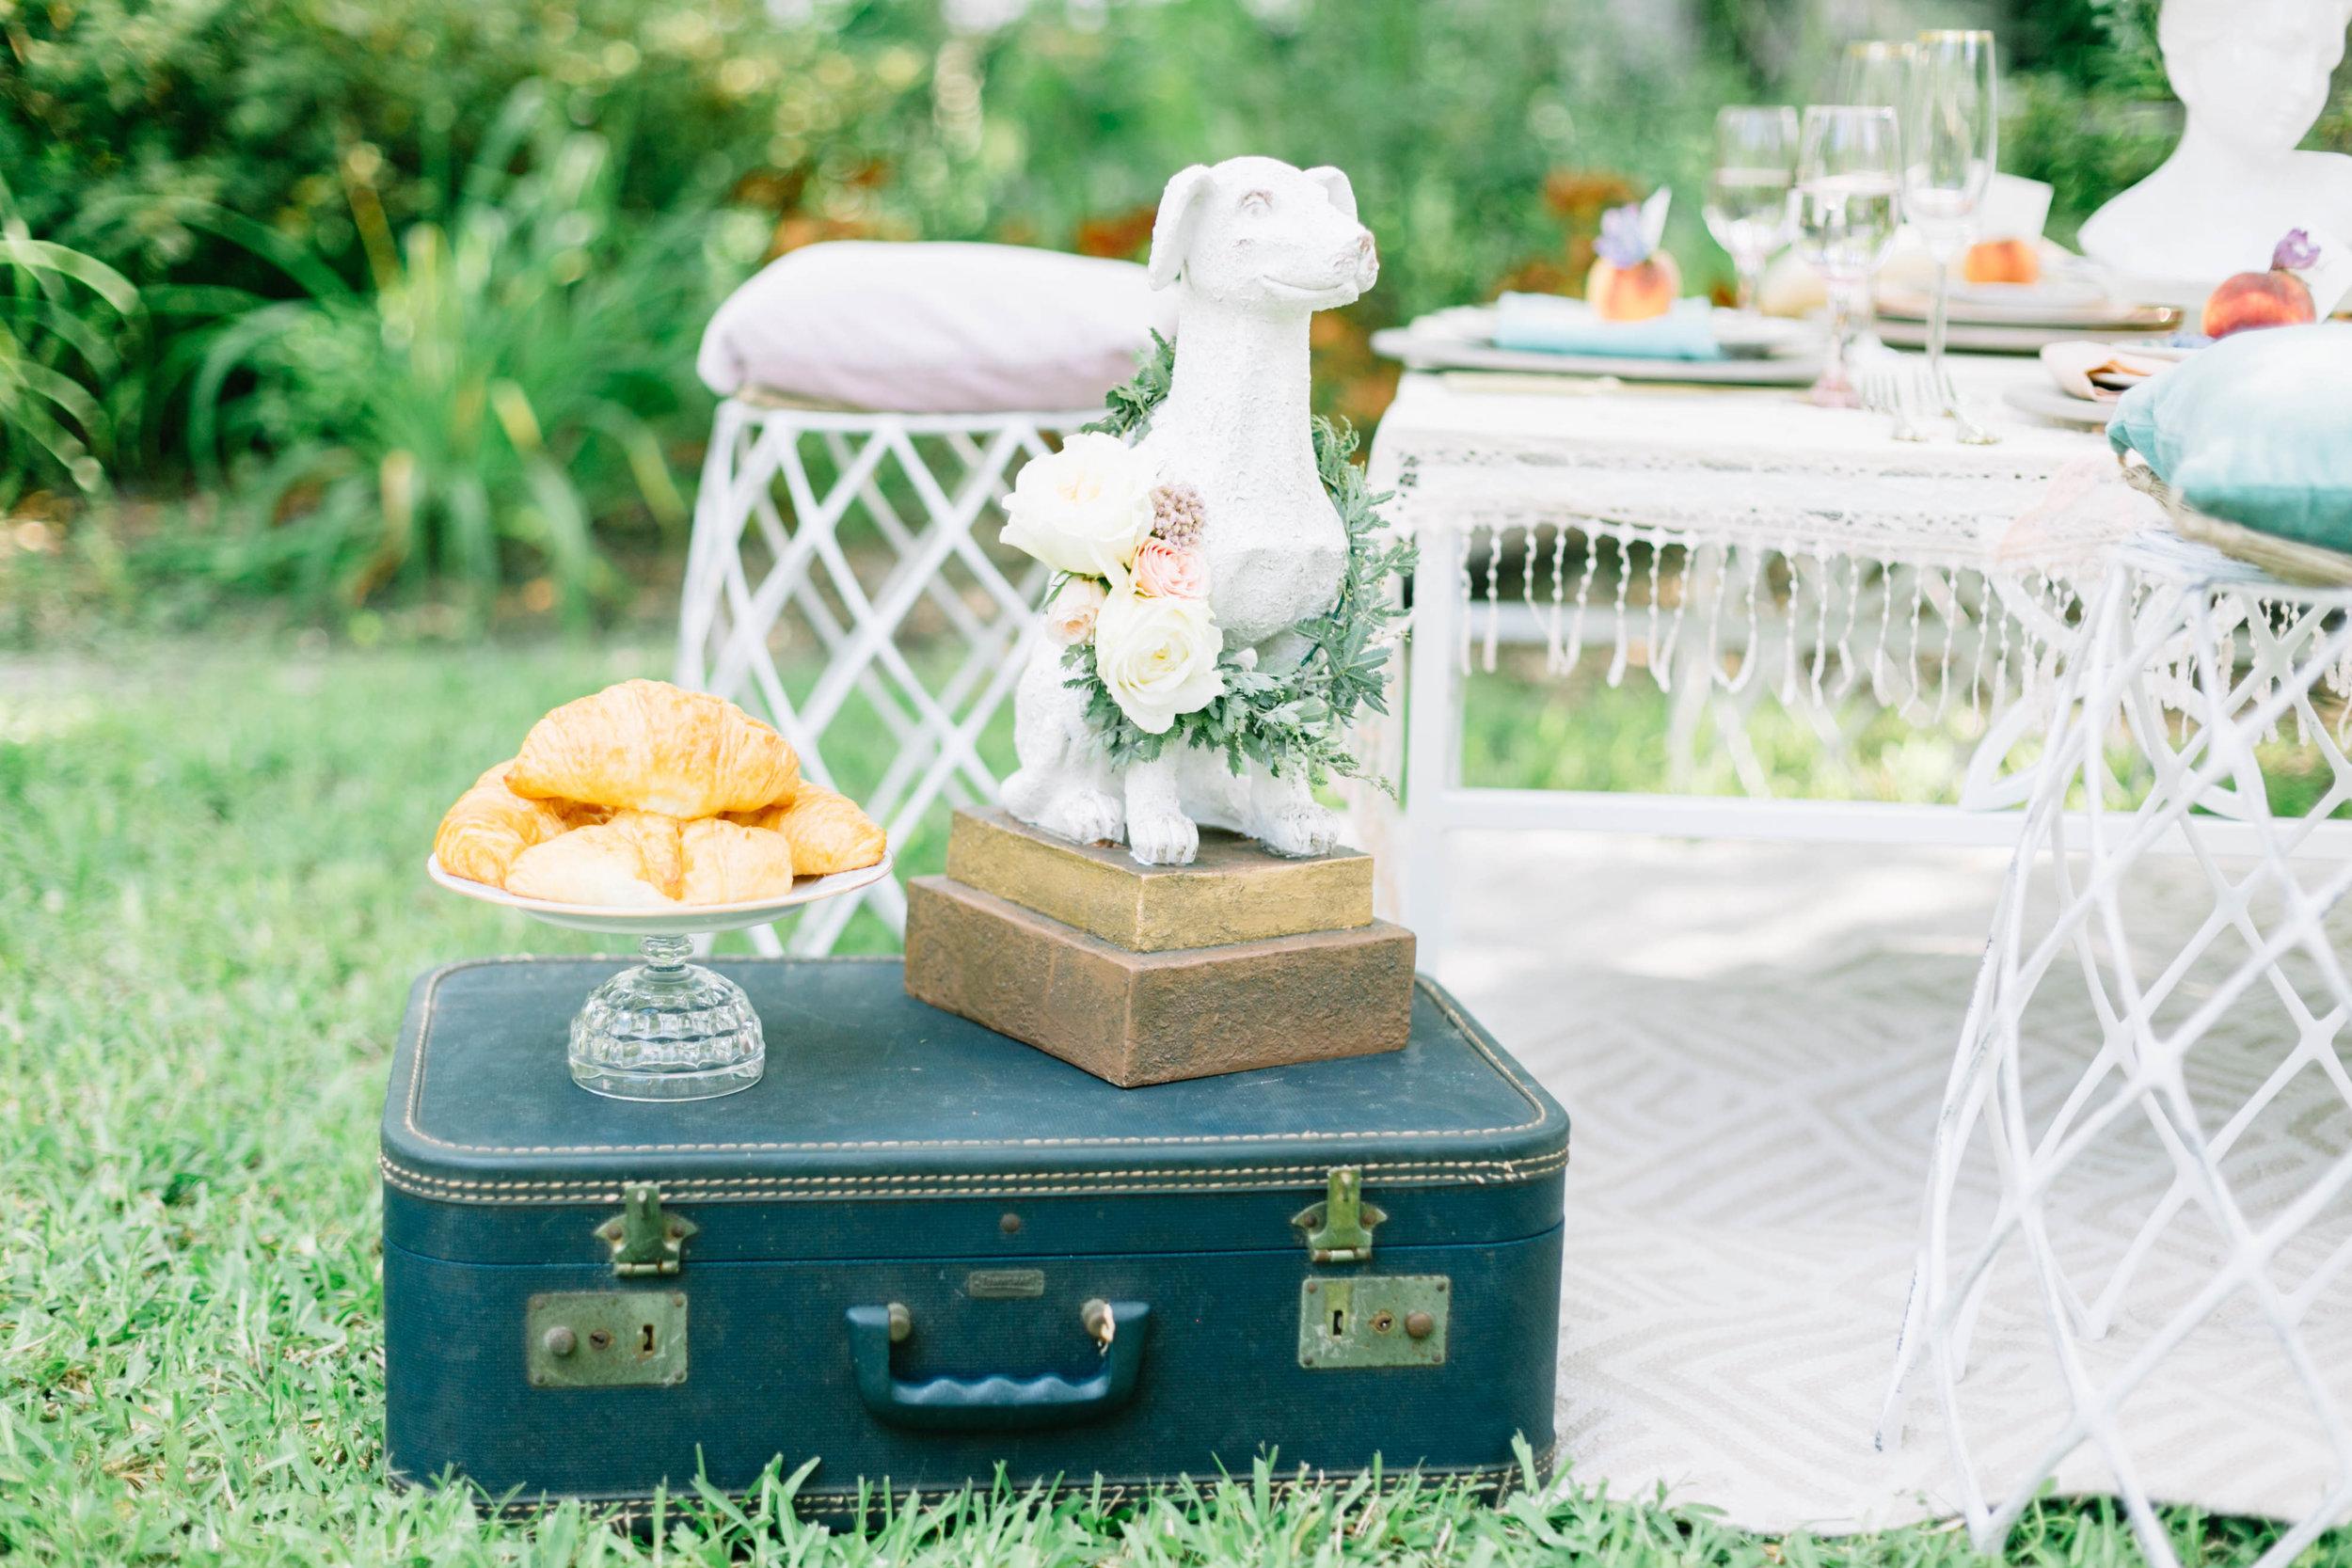 cypress gardens charleston bridal shower wedding planners (12).jpg